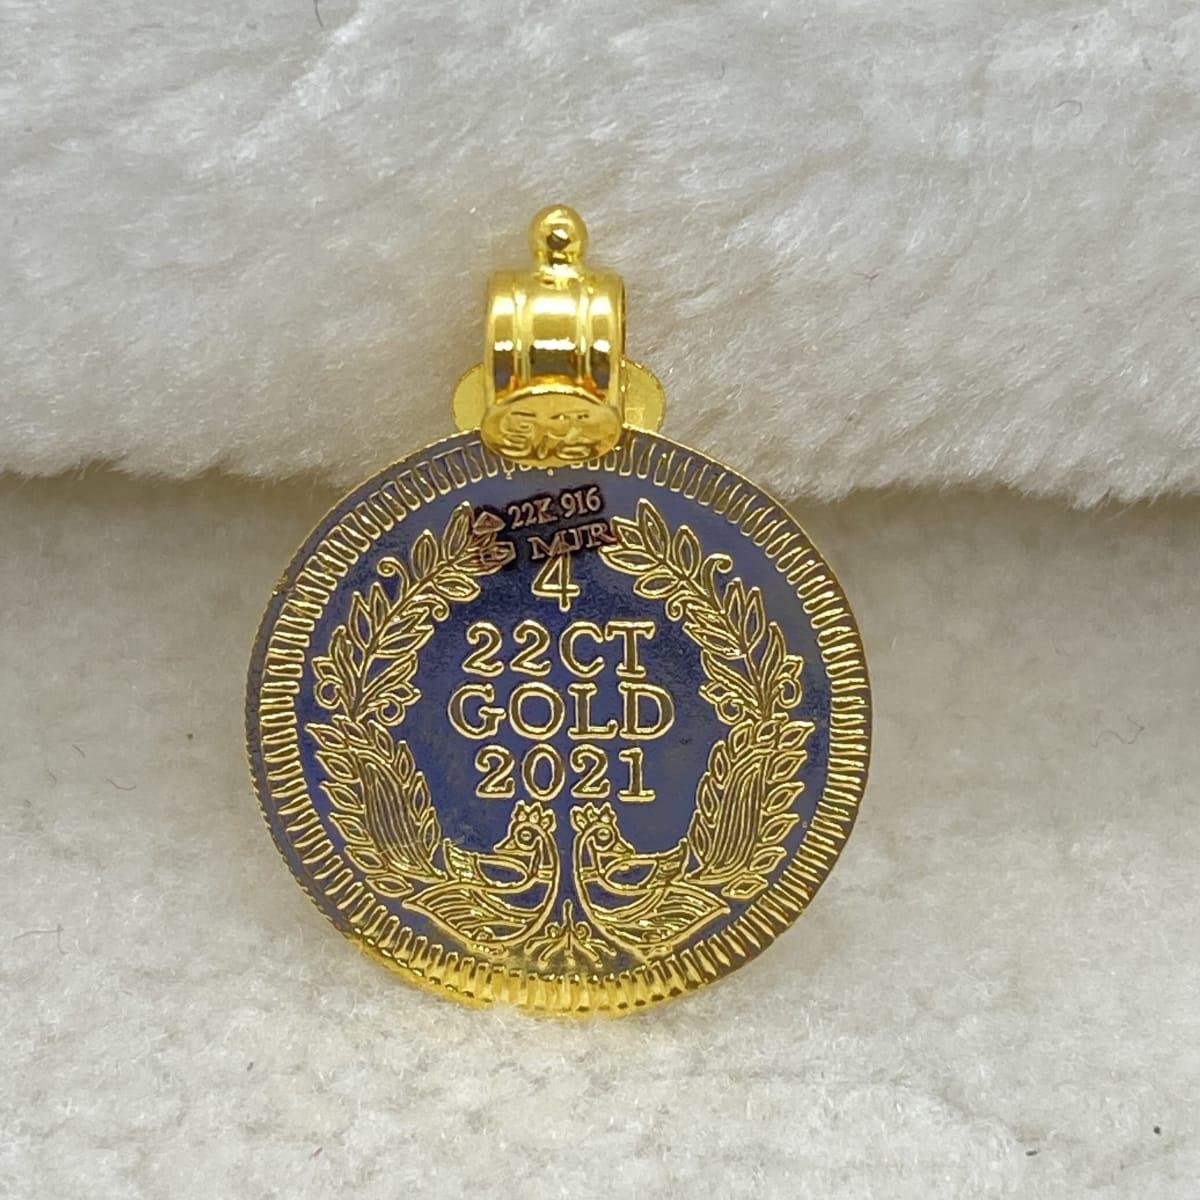 Fancy Gajjalakshmi Kase Gj0170